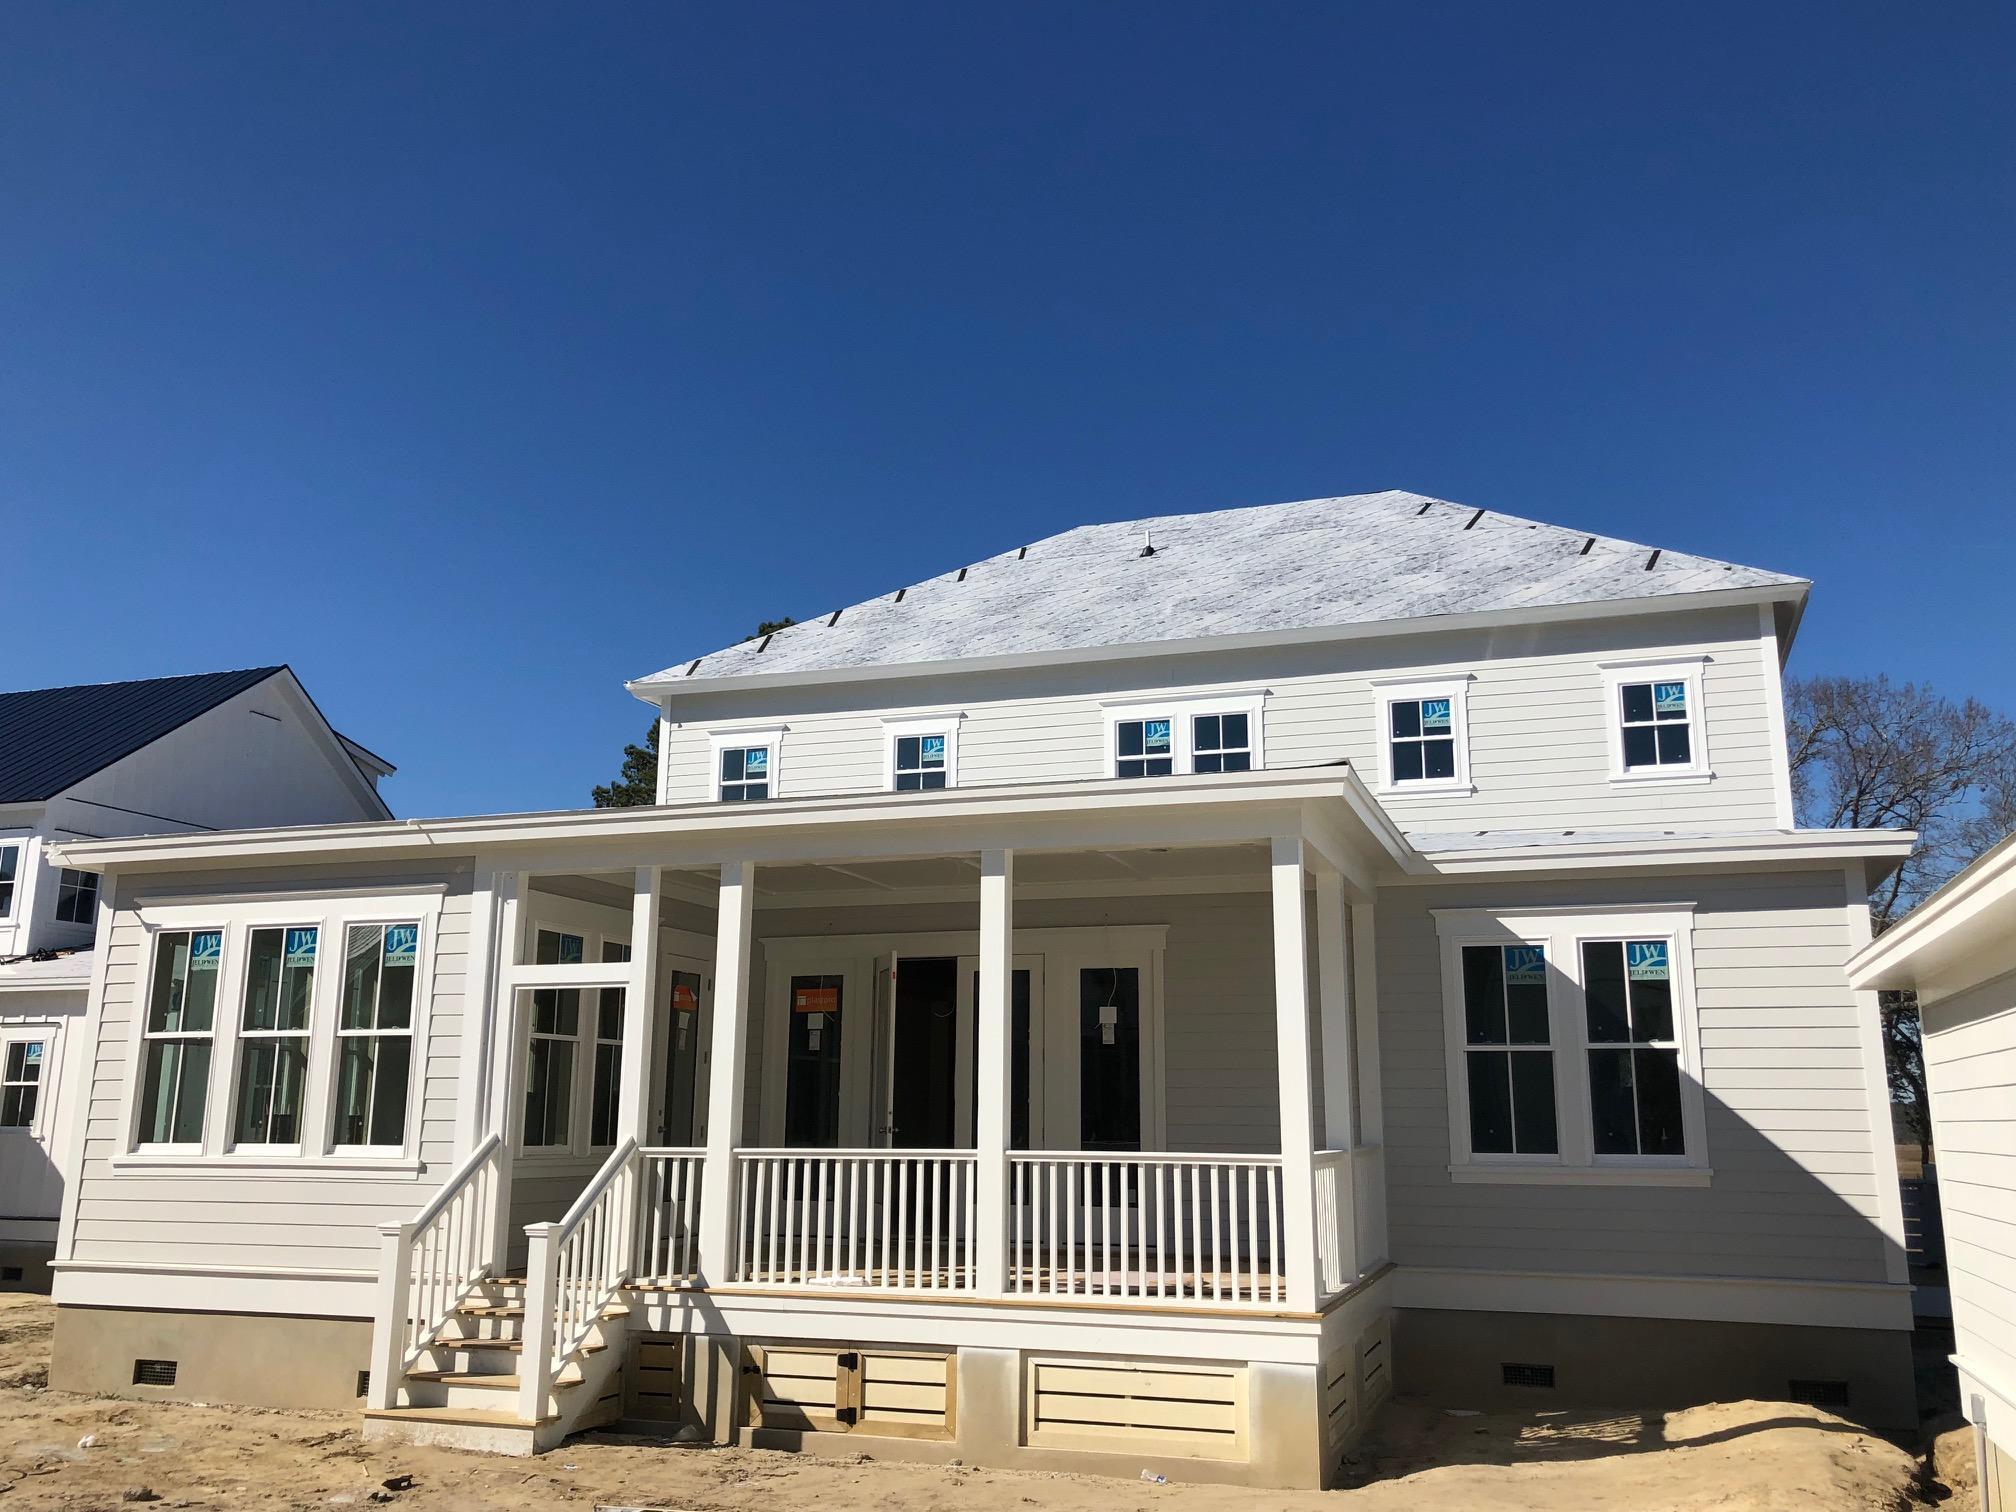 Daniel Island Homes For Sale - 532 Lesesne, Charleston, SC - 6